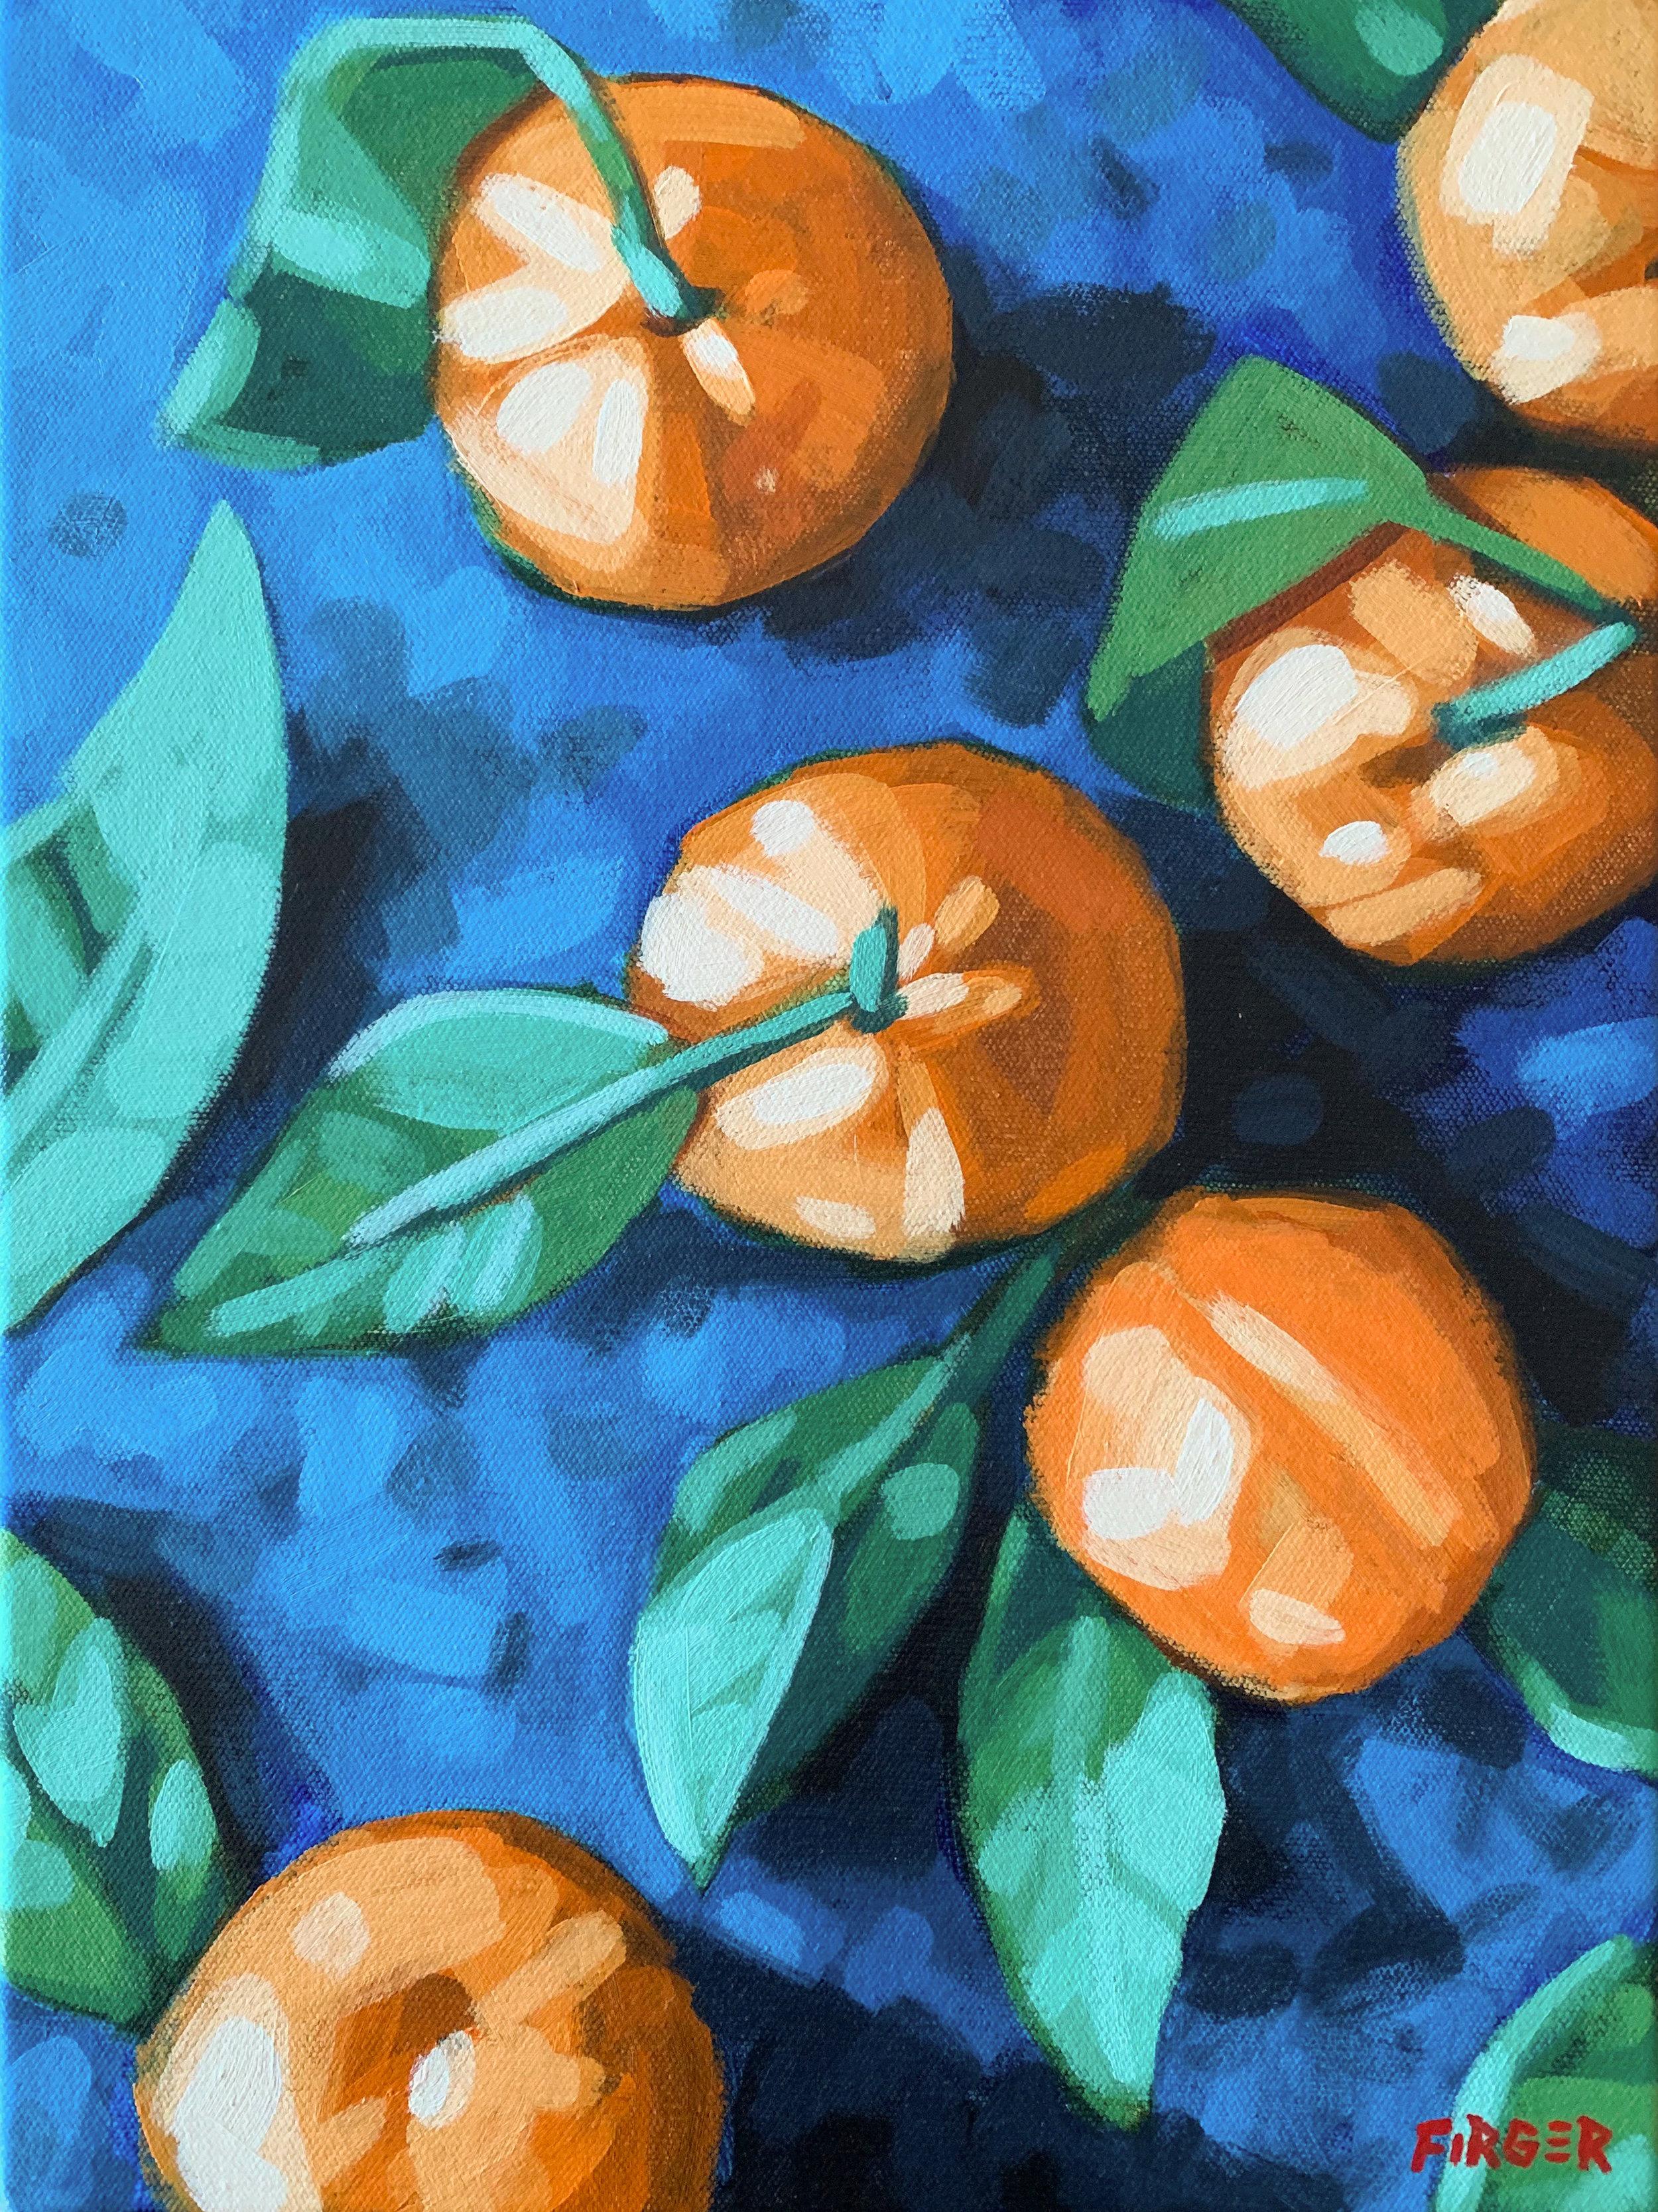 Citrus Season - 12 x 16, Acrylic on Canvas (SOLD)